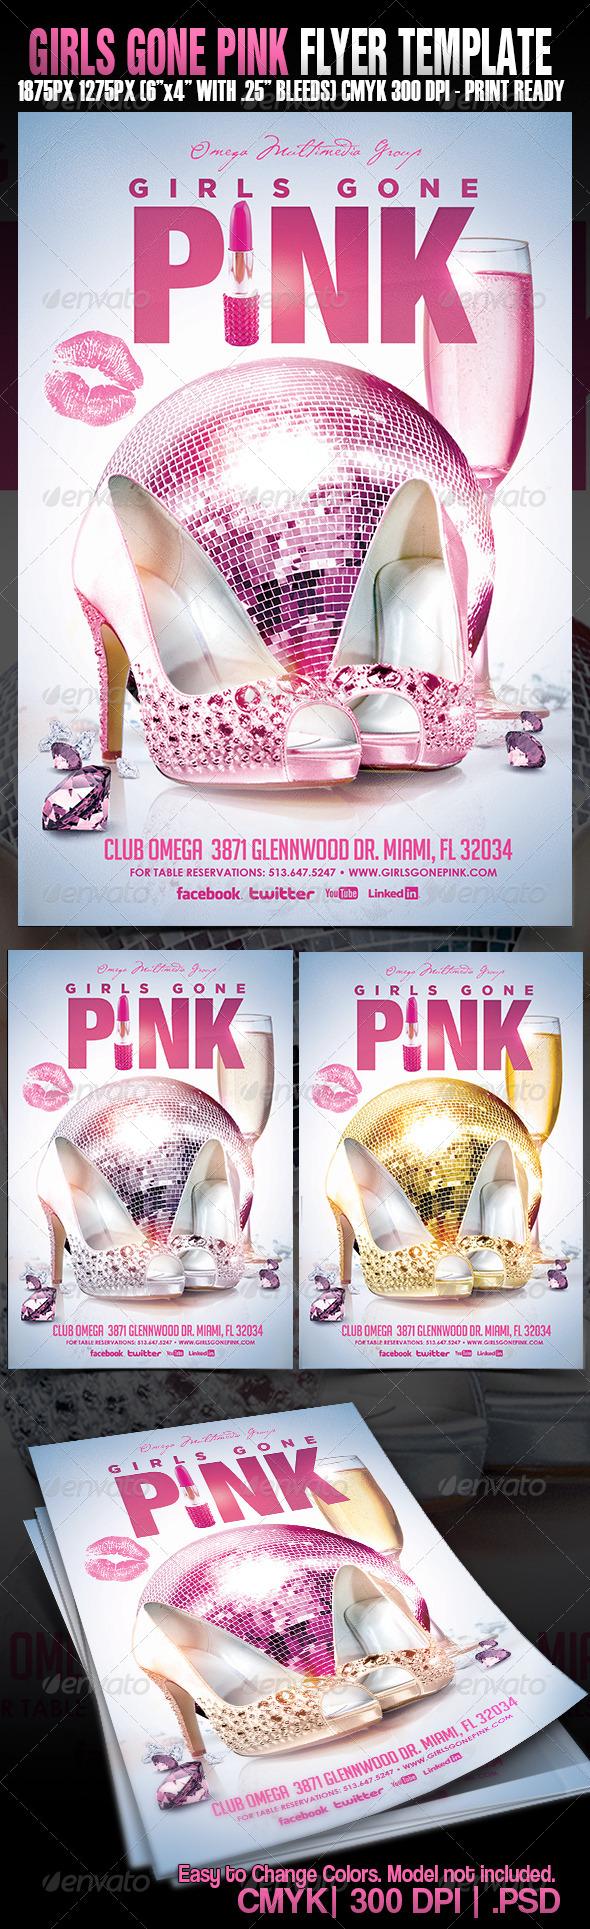 Girls Gone Pink